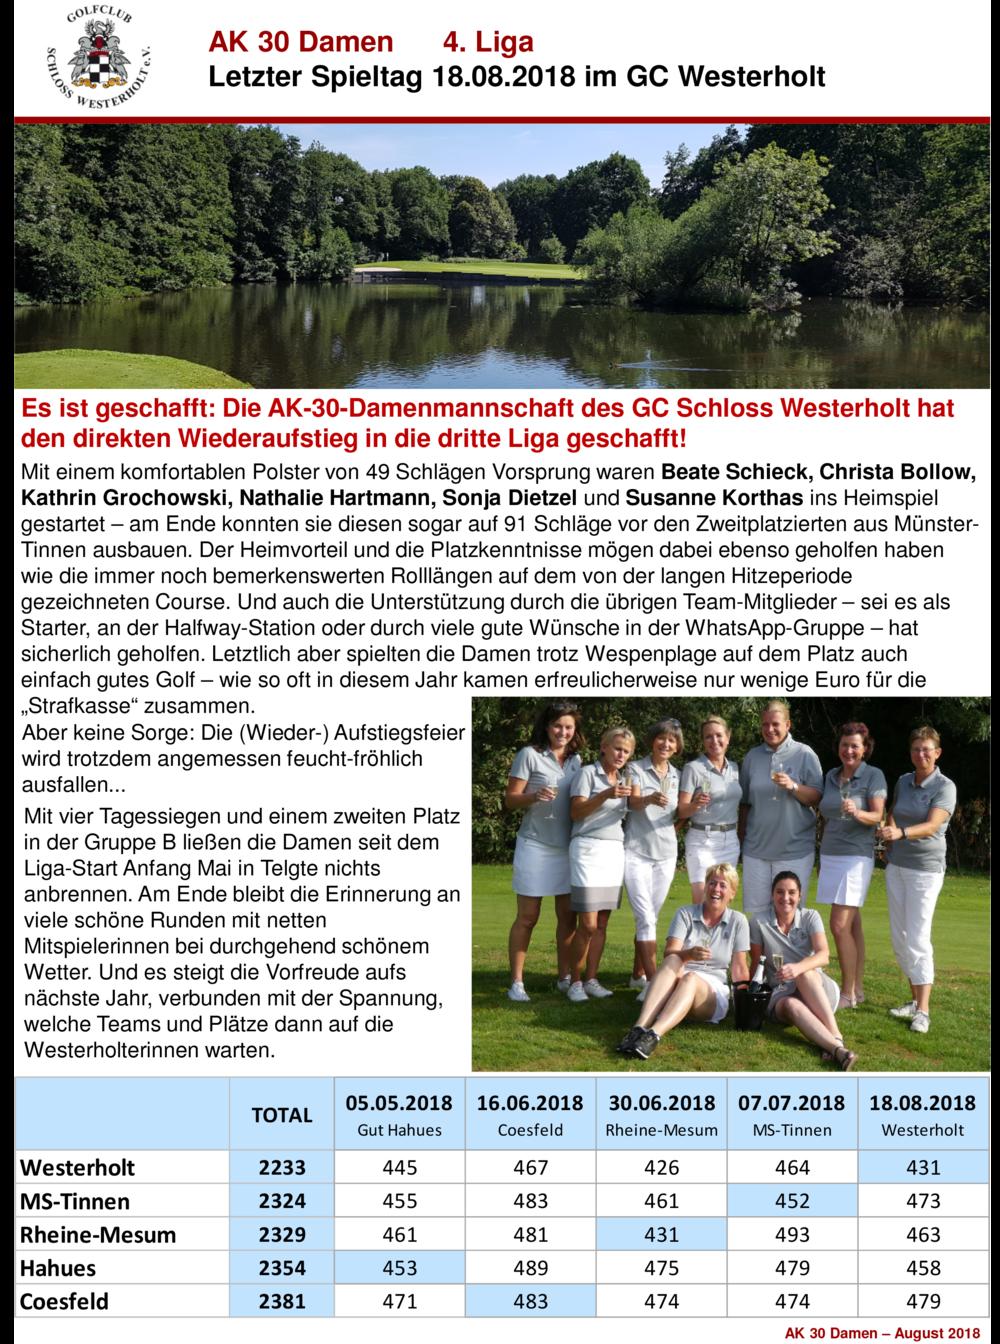 2018 AK30 08-18 Westerholt Spielbericht.png